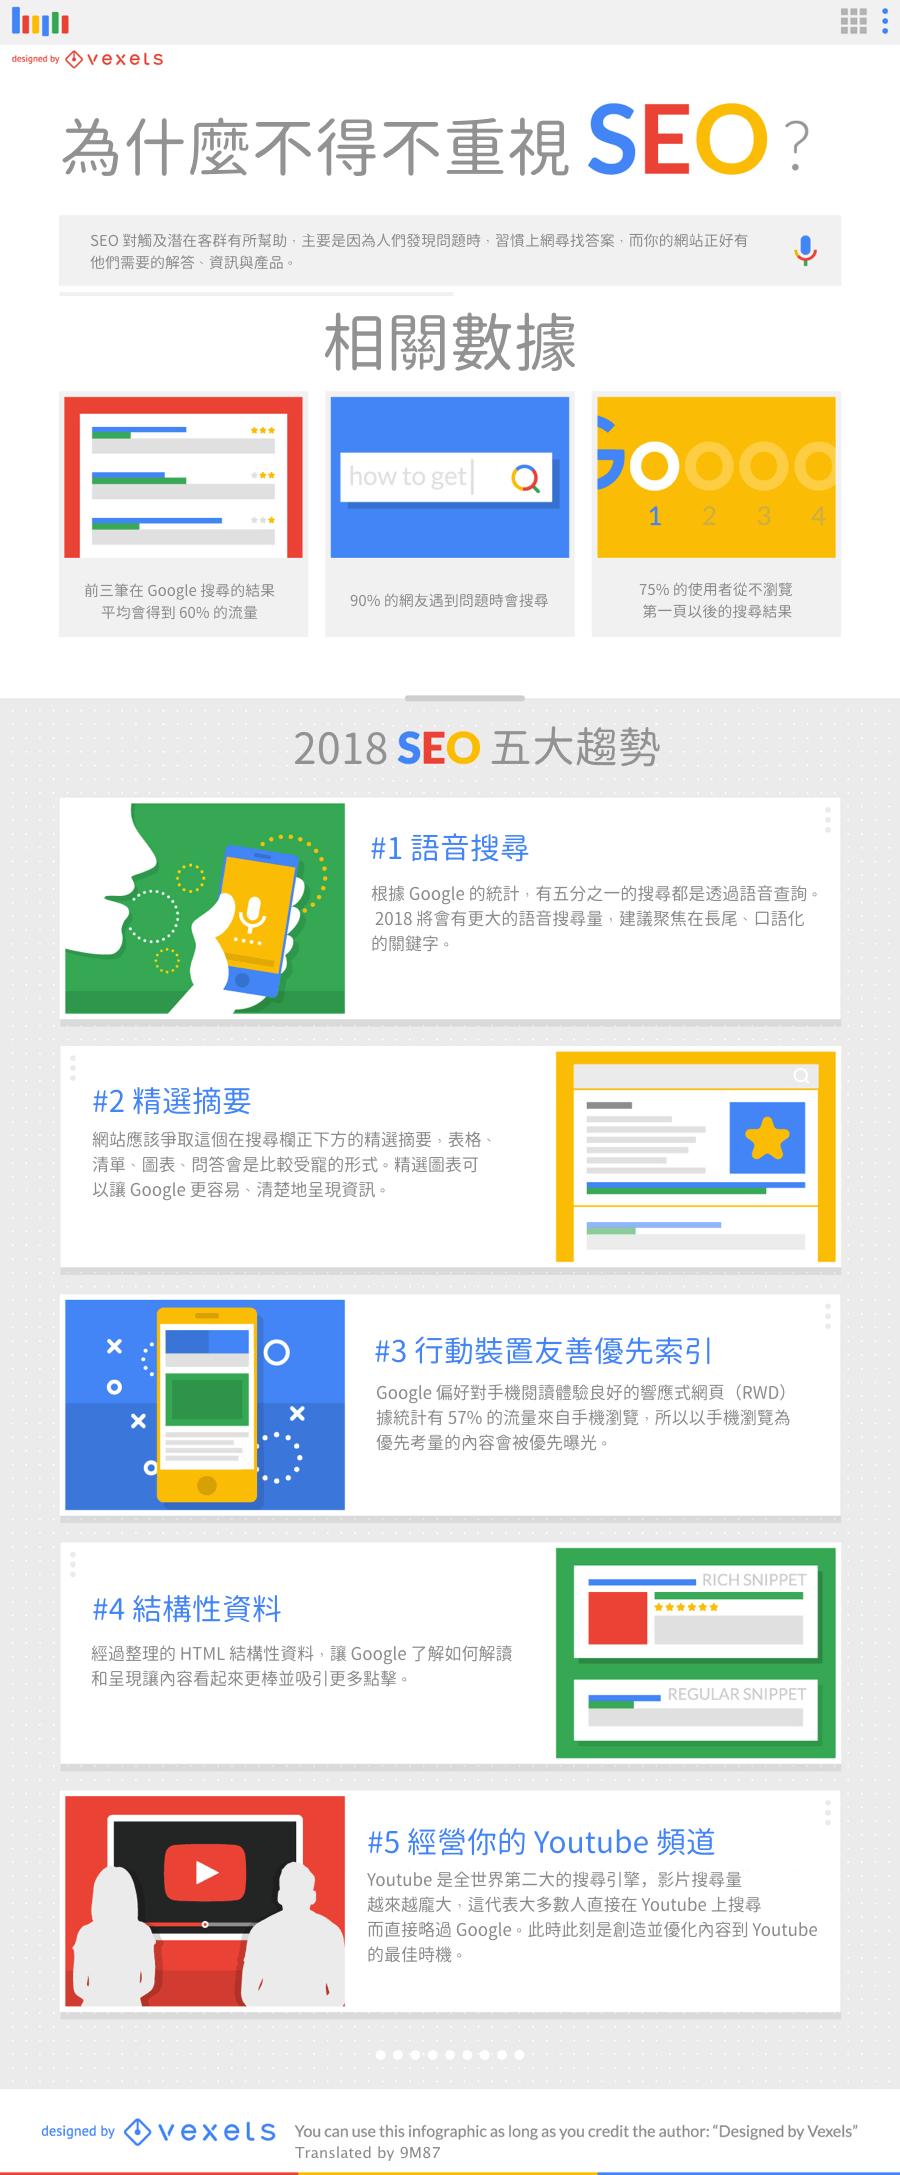 2018 SEO 重要性 趨勢 語音搜尋 摘要 RWD 行動裝置 Youtube